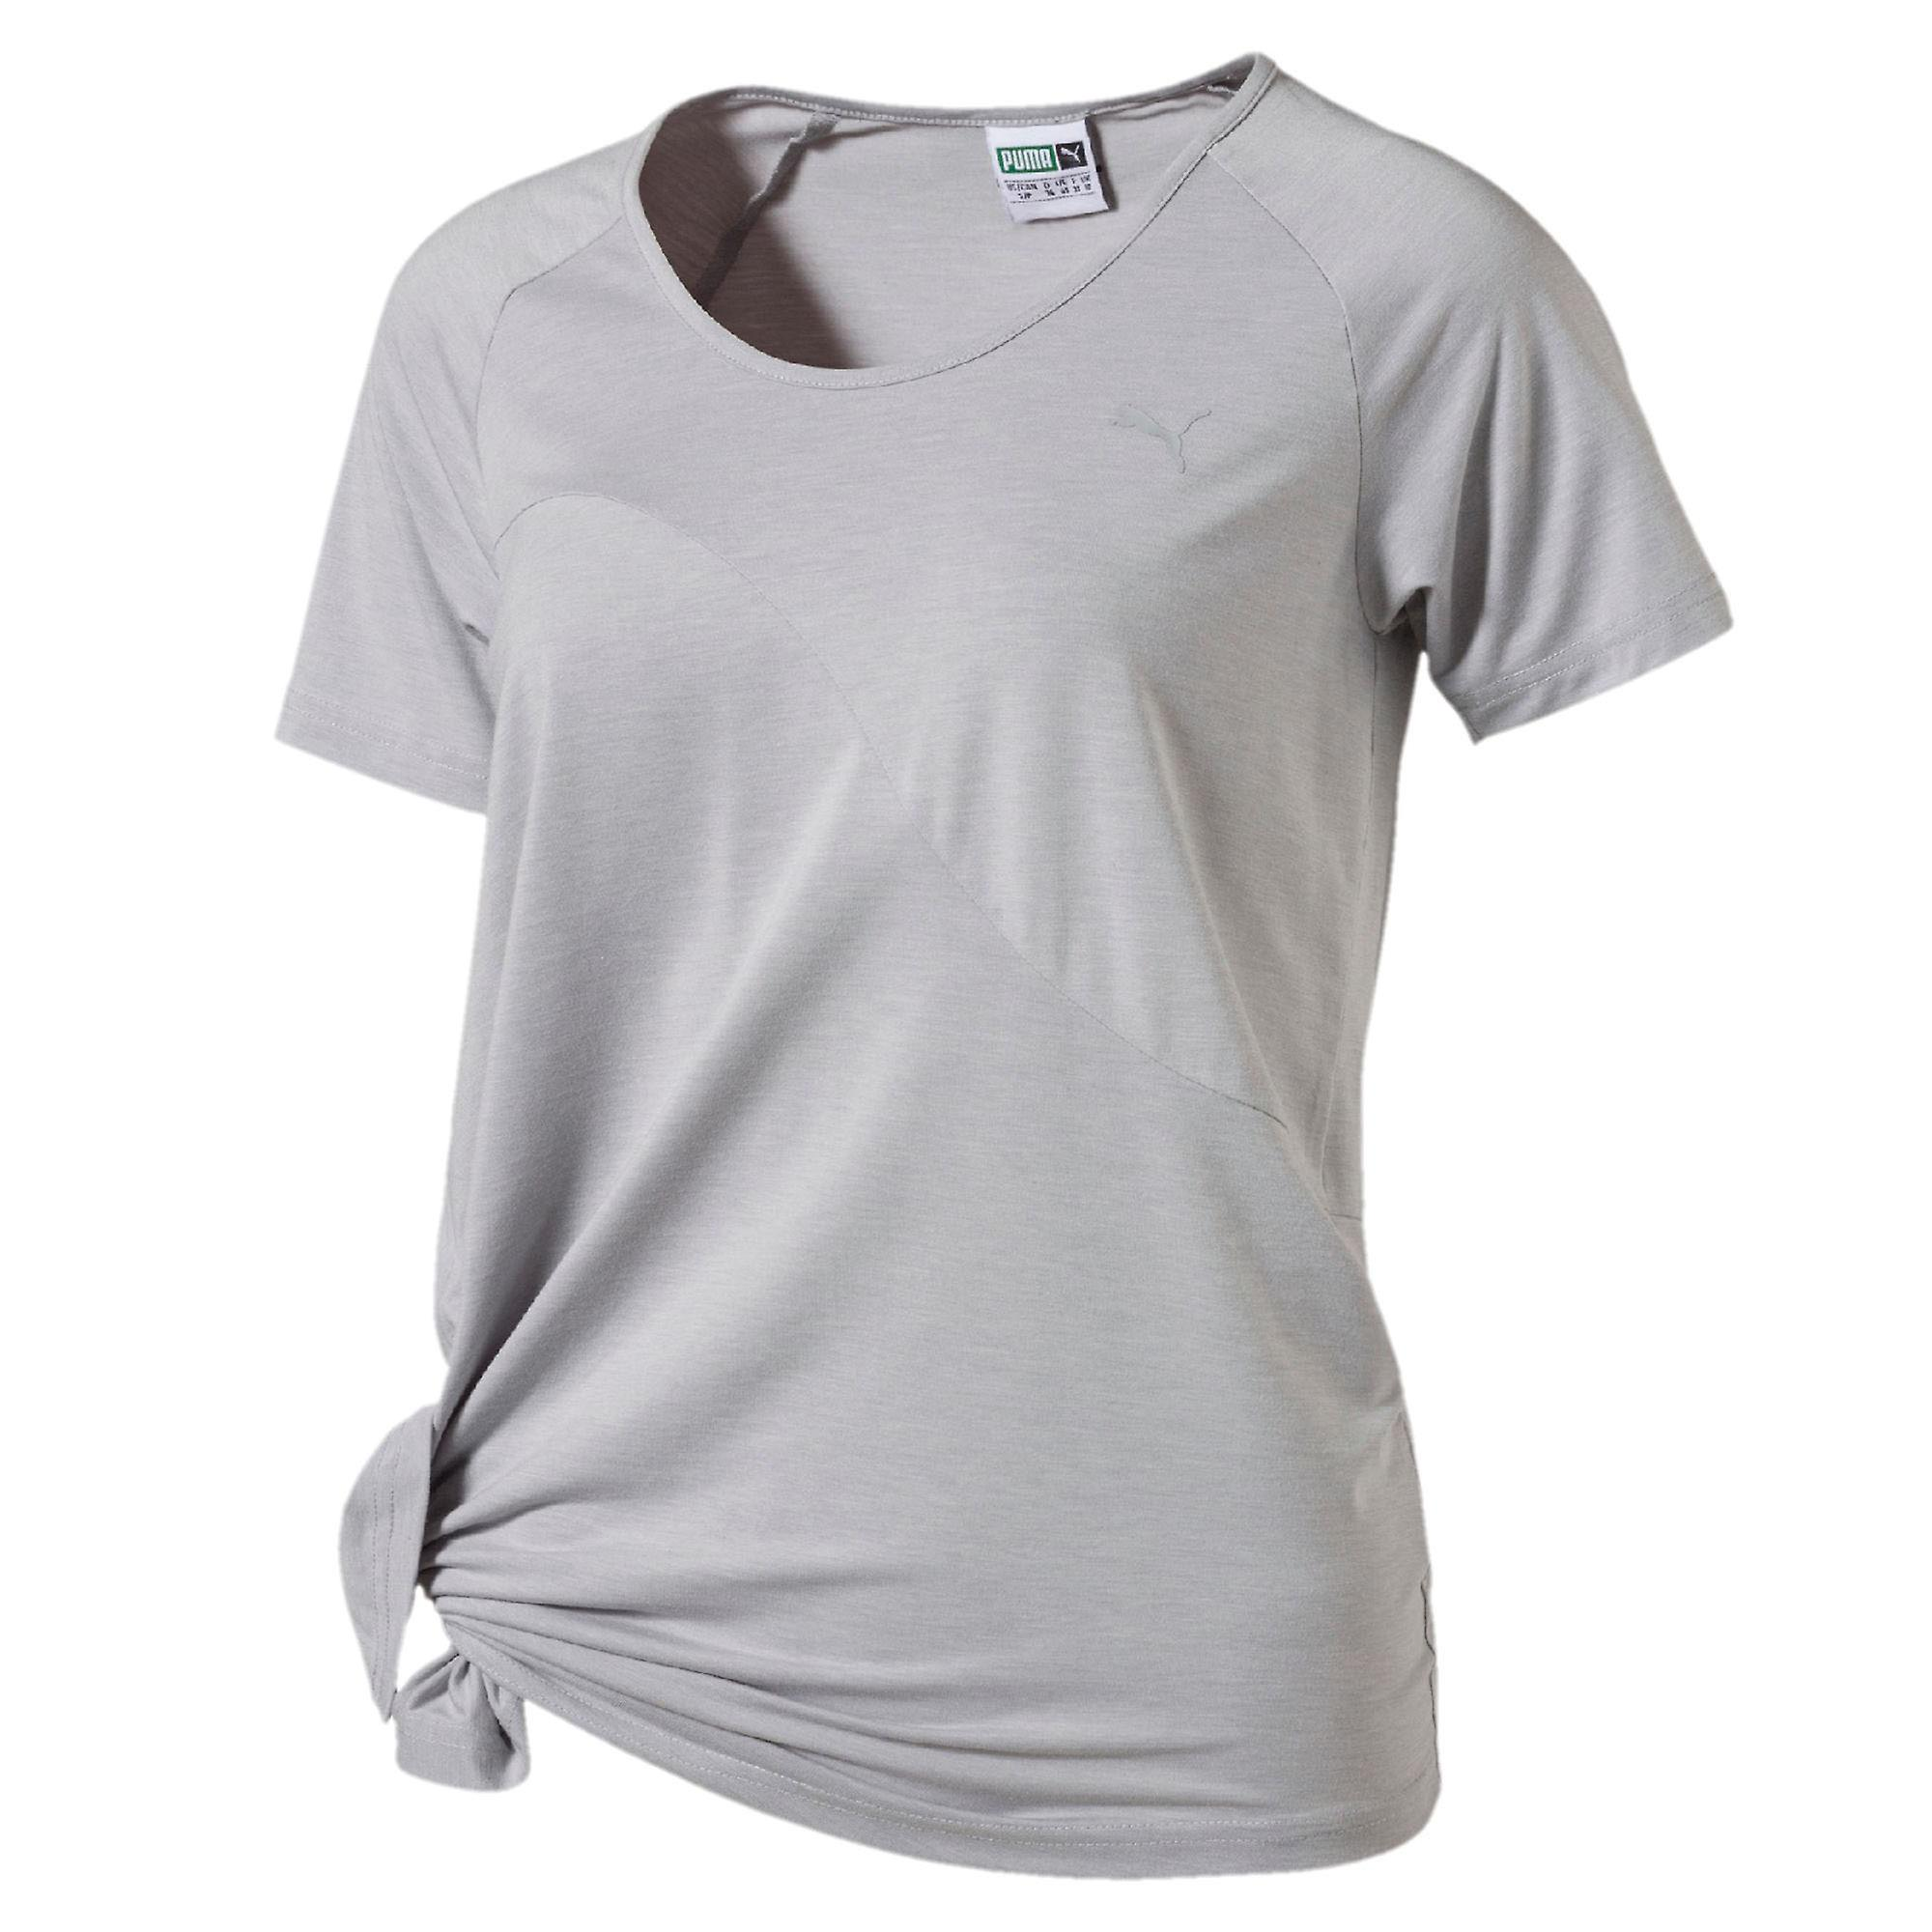 Puma Evo Side Knot Womens Ladies Fitness T-Shirt Tee Grey